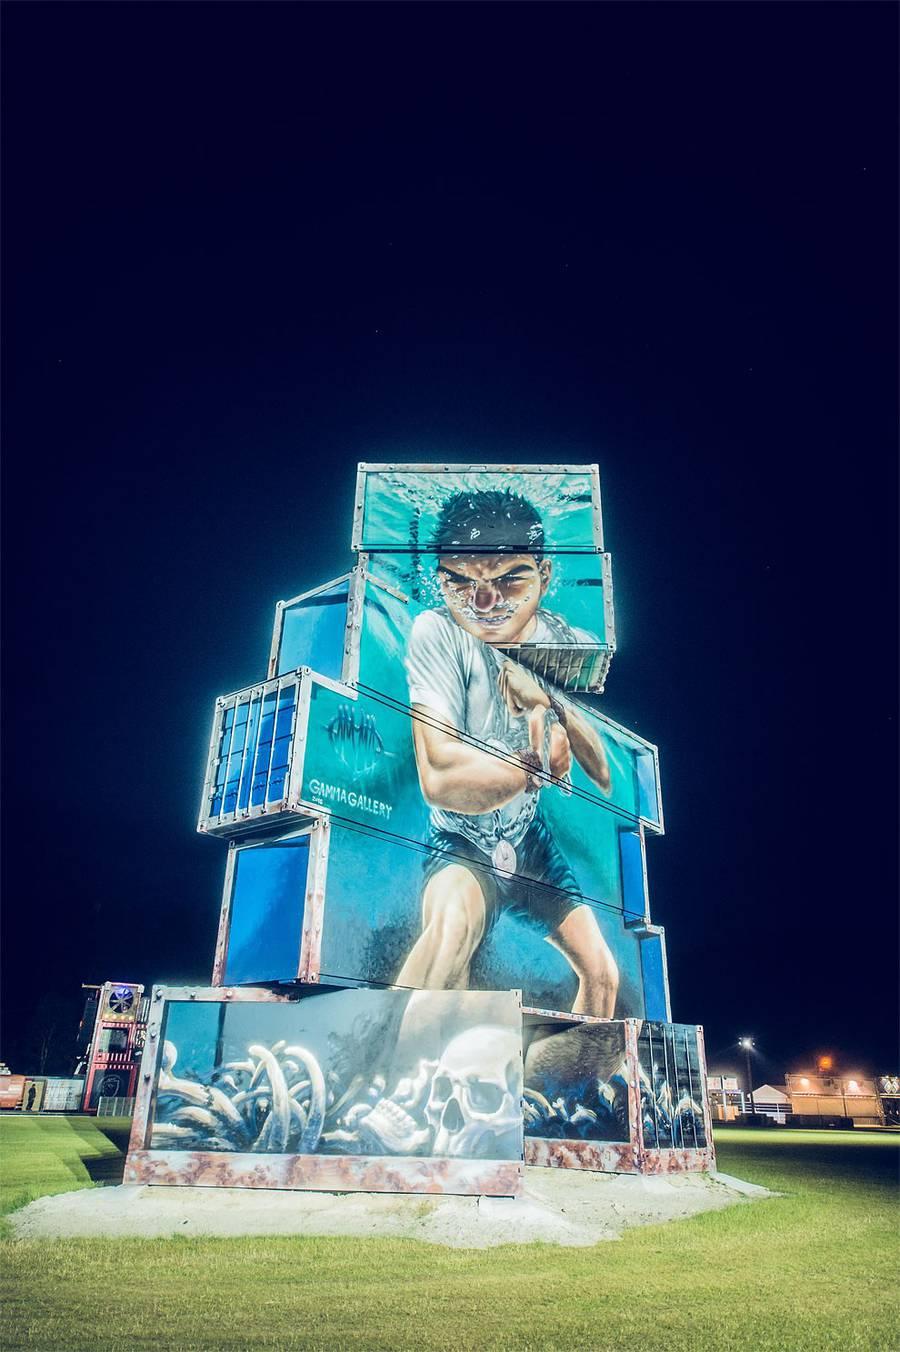 opere-street-art-arne-quinze-north-west-walls-2